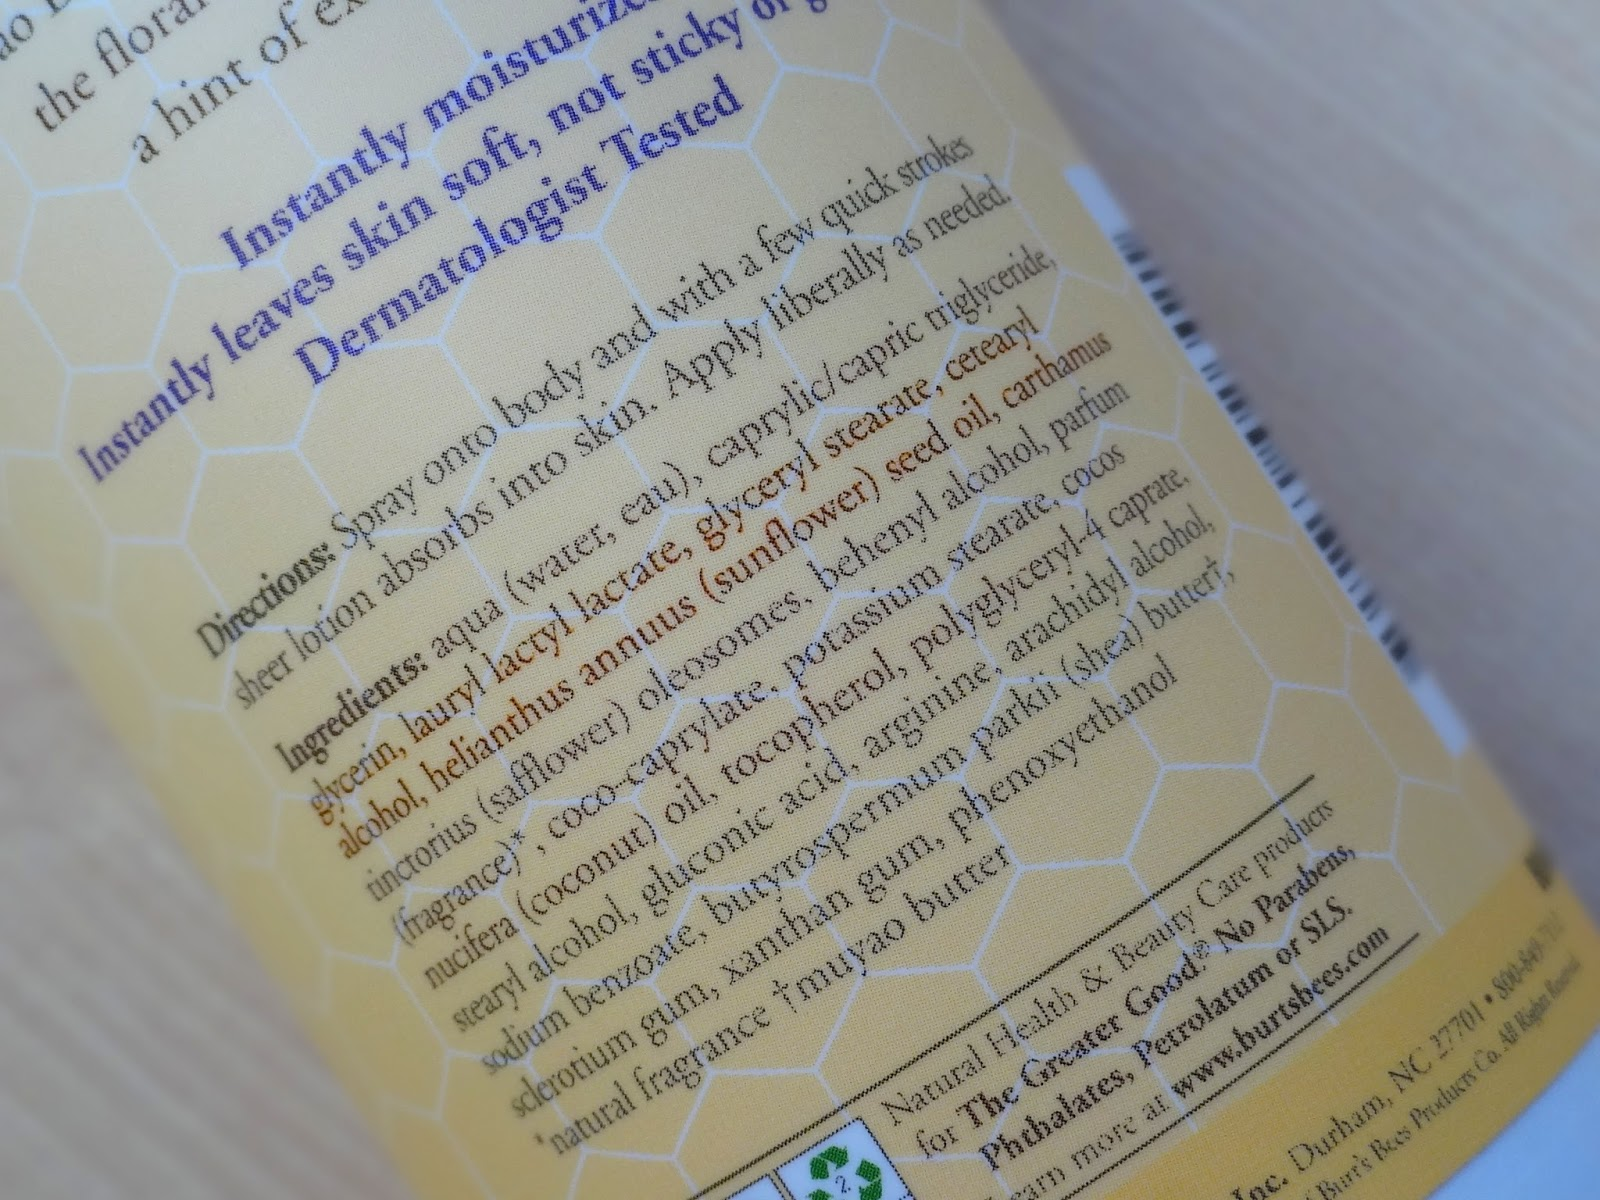 Burt's Bees Violet & Mango Sheer Body Lotion Ingredients